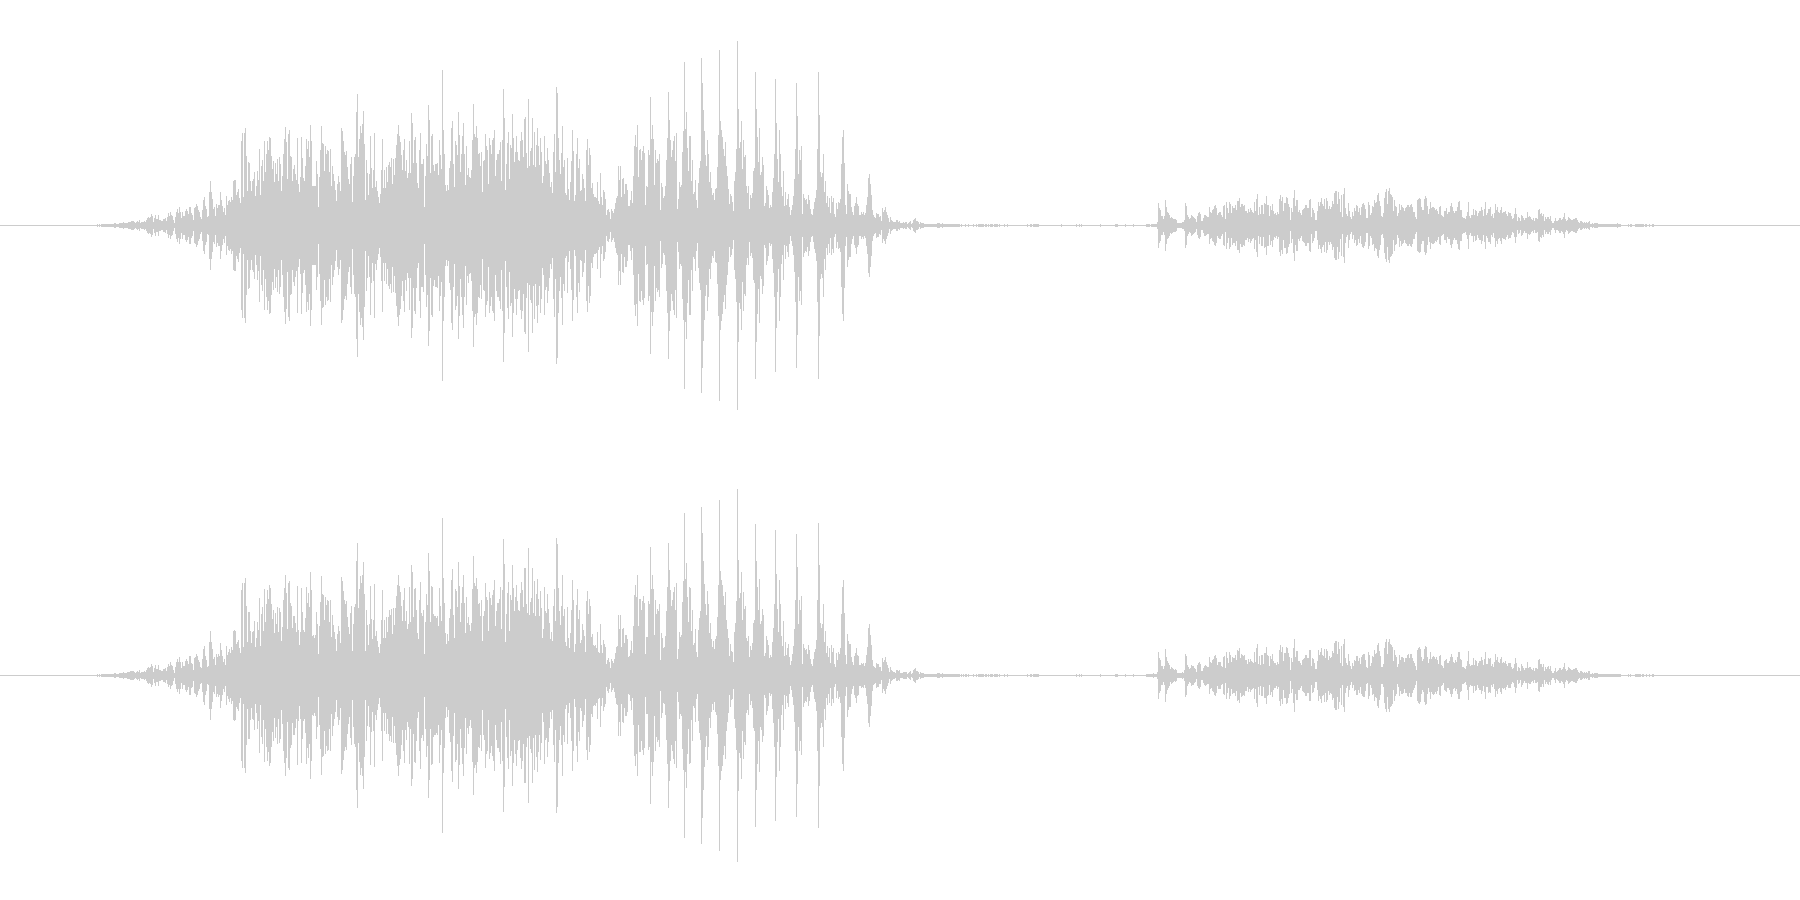 6 (six, 英語、男国女性声優J1)の未再生の波形